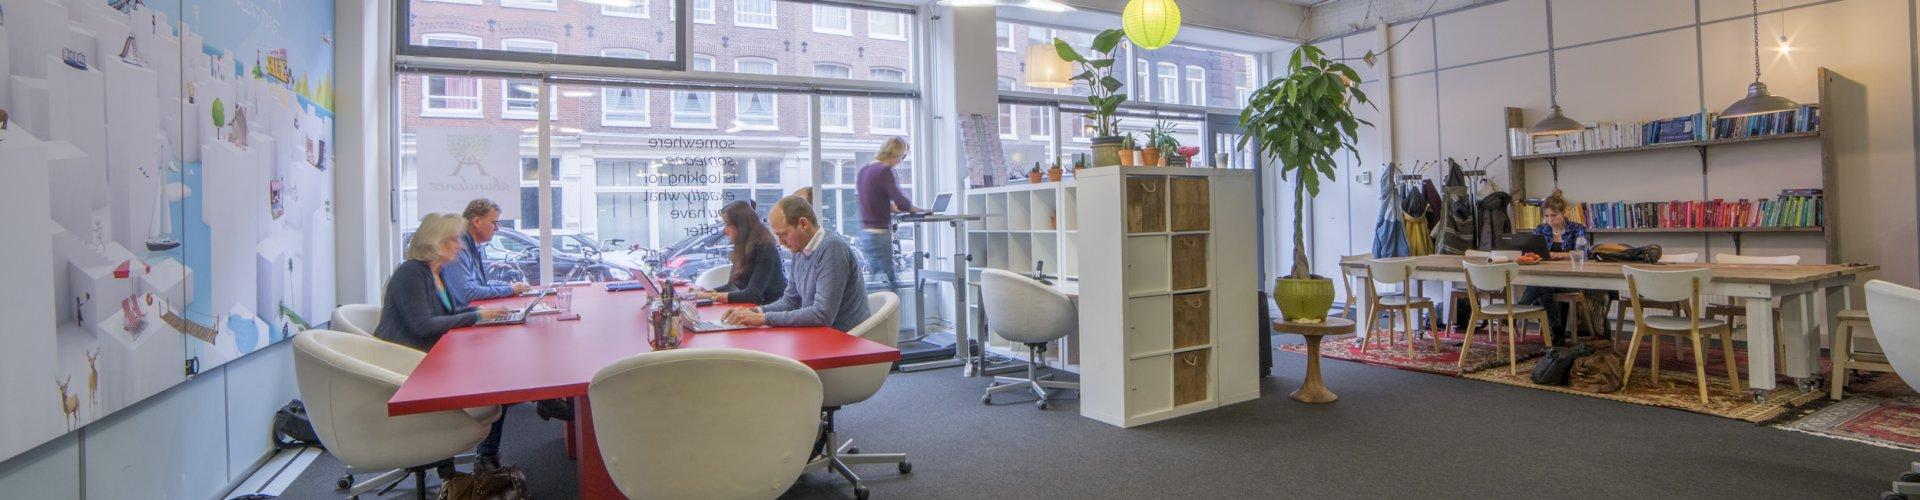 TalentFirst Amsterdam